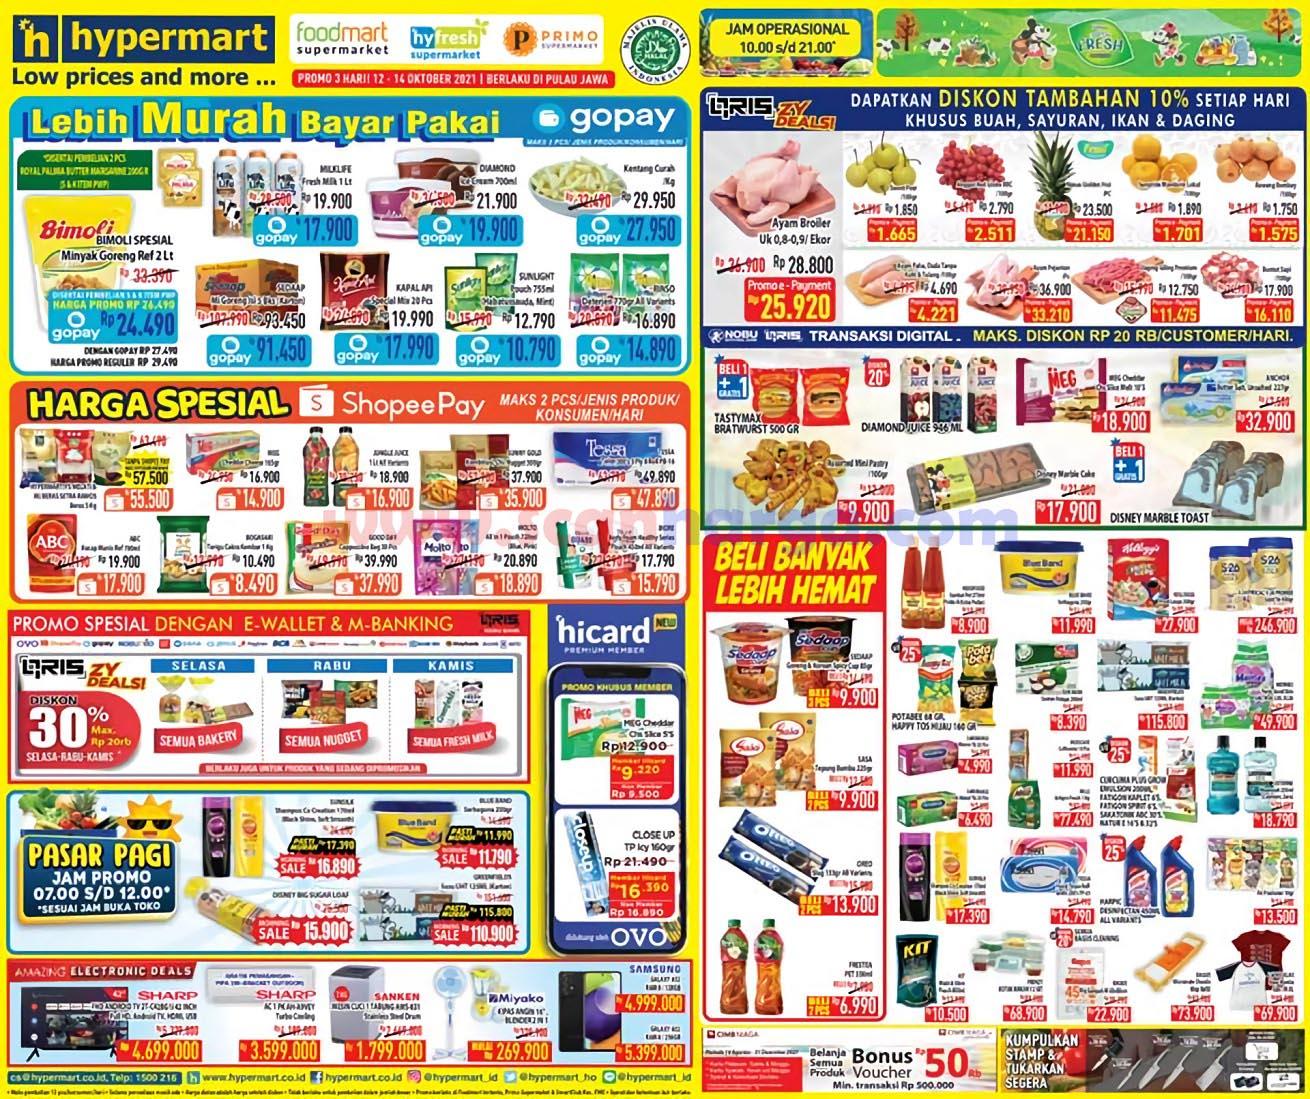 Katalog Promo HyperMart Weekday 12 - 14 Oktober 2021